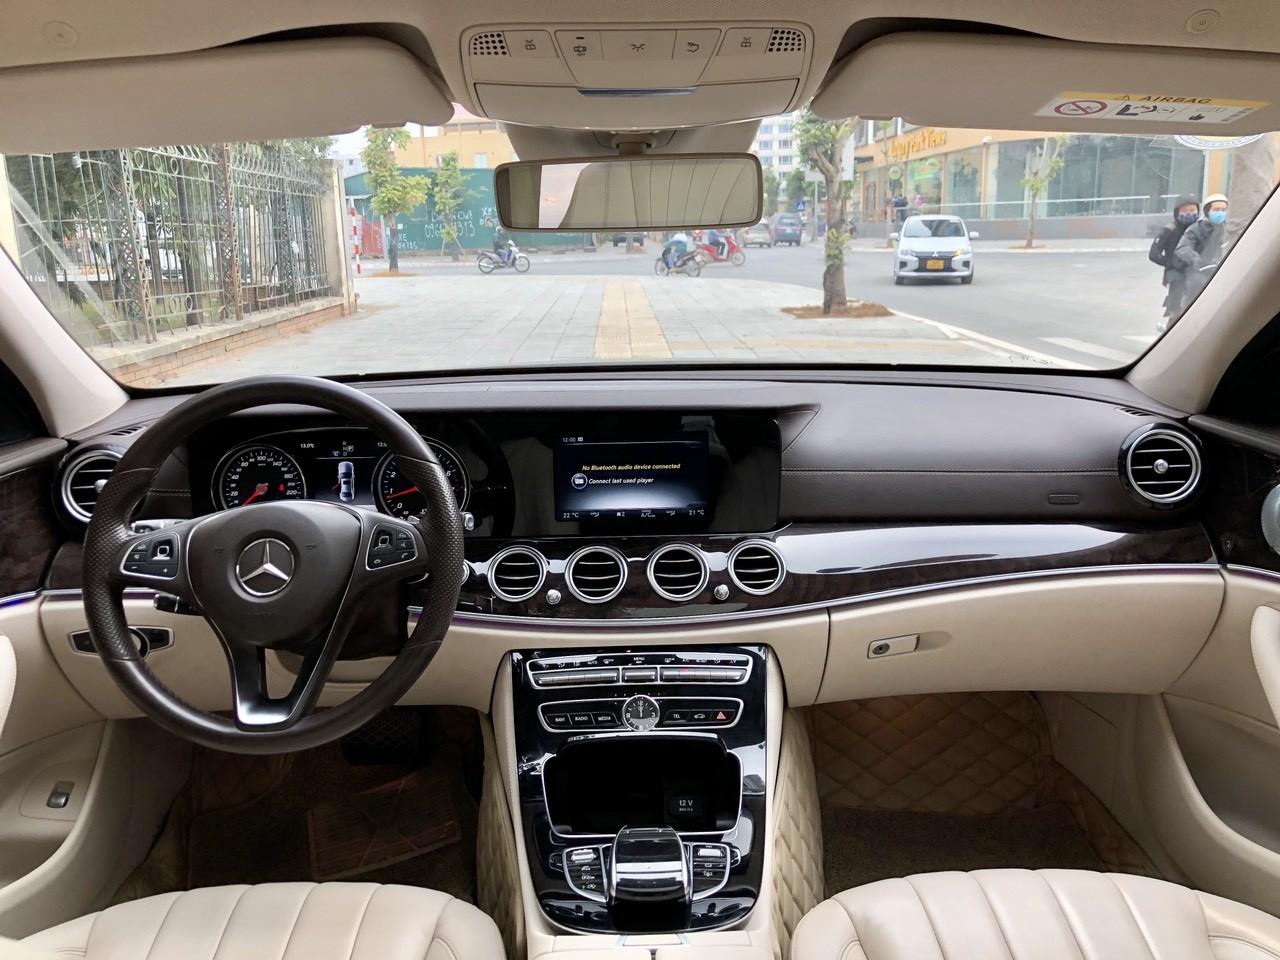 Bán Mercedes E250 sản xuất 2016 đen